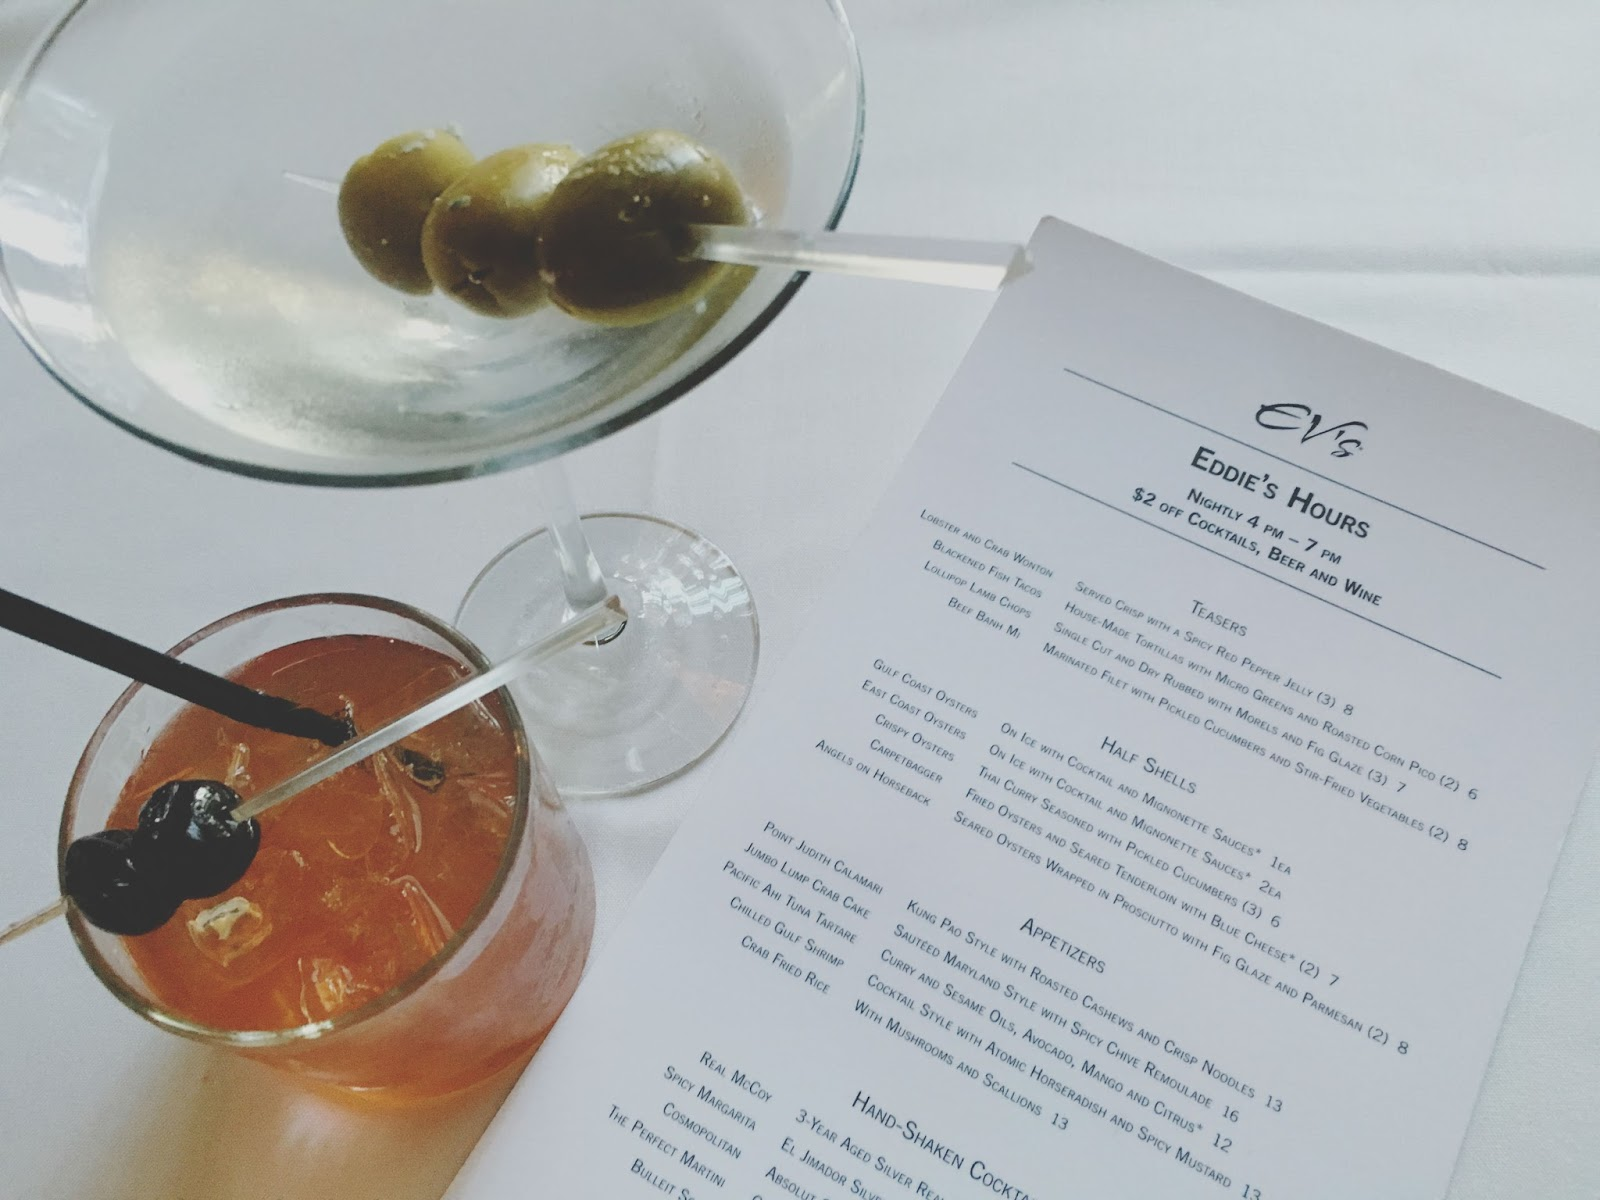 drinks at Eddie V's - A restaurant in Houston, Texas